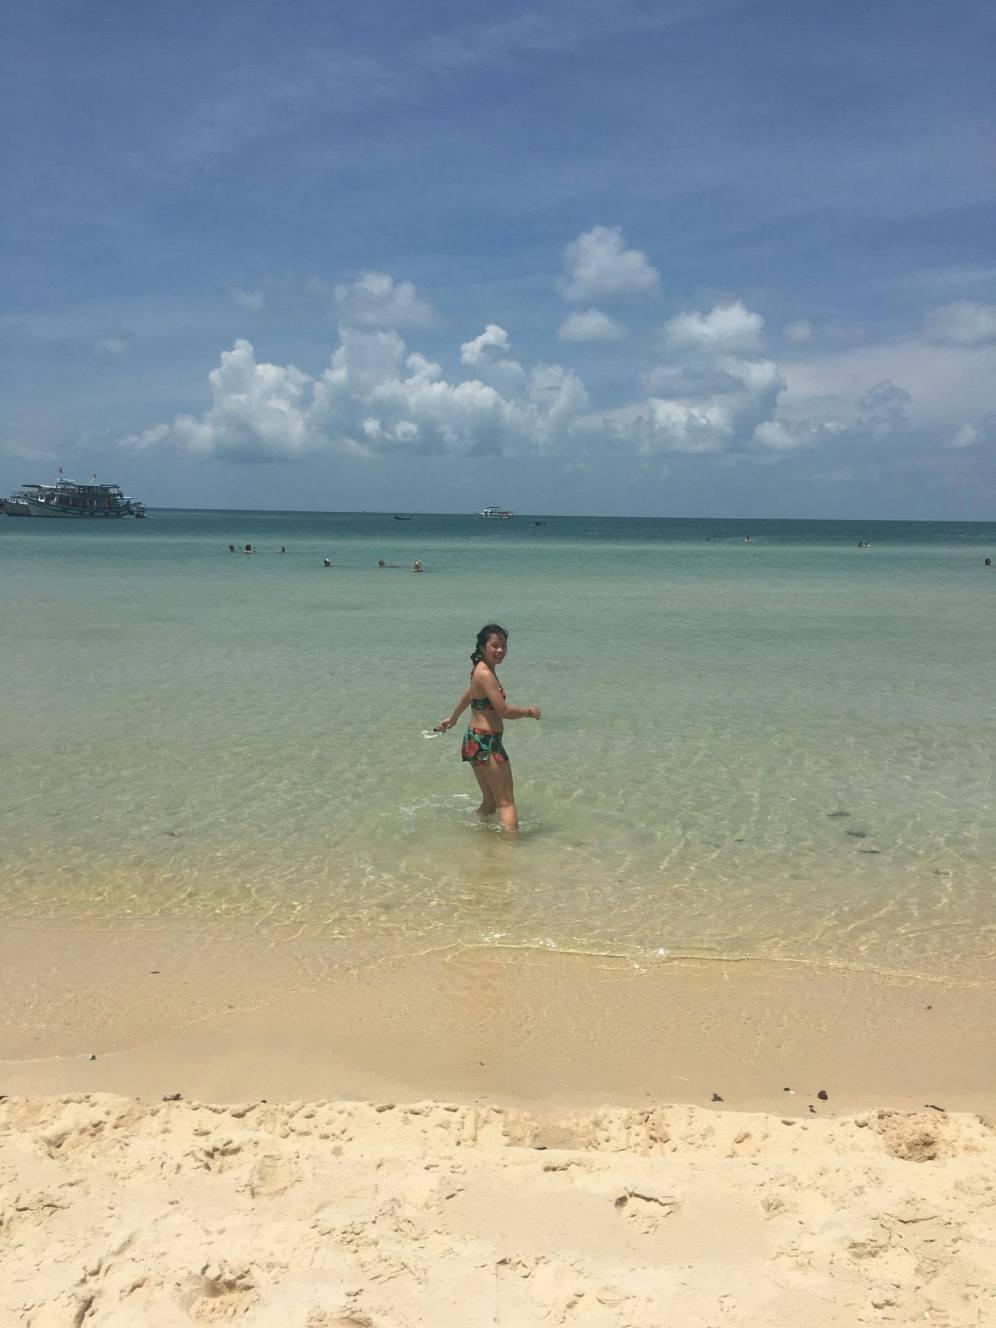 The Star Beach